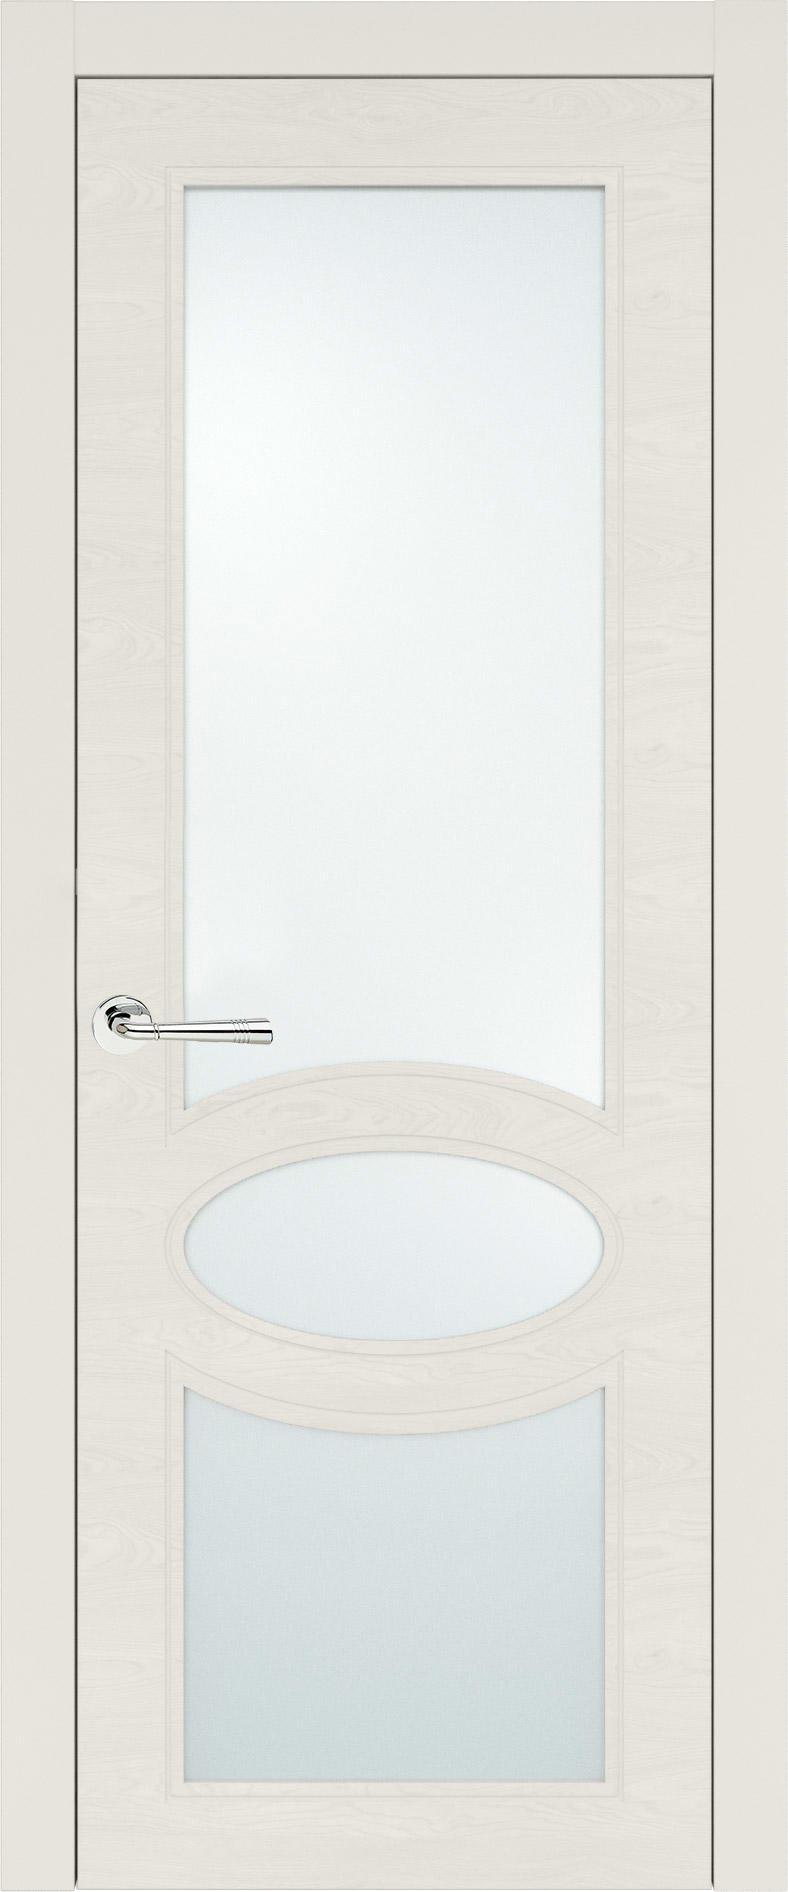 Florencia Neo Classic цвет - Бежевая эмаль по шпону (RAL 9010) Со стеклом (ДО)